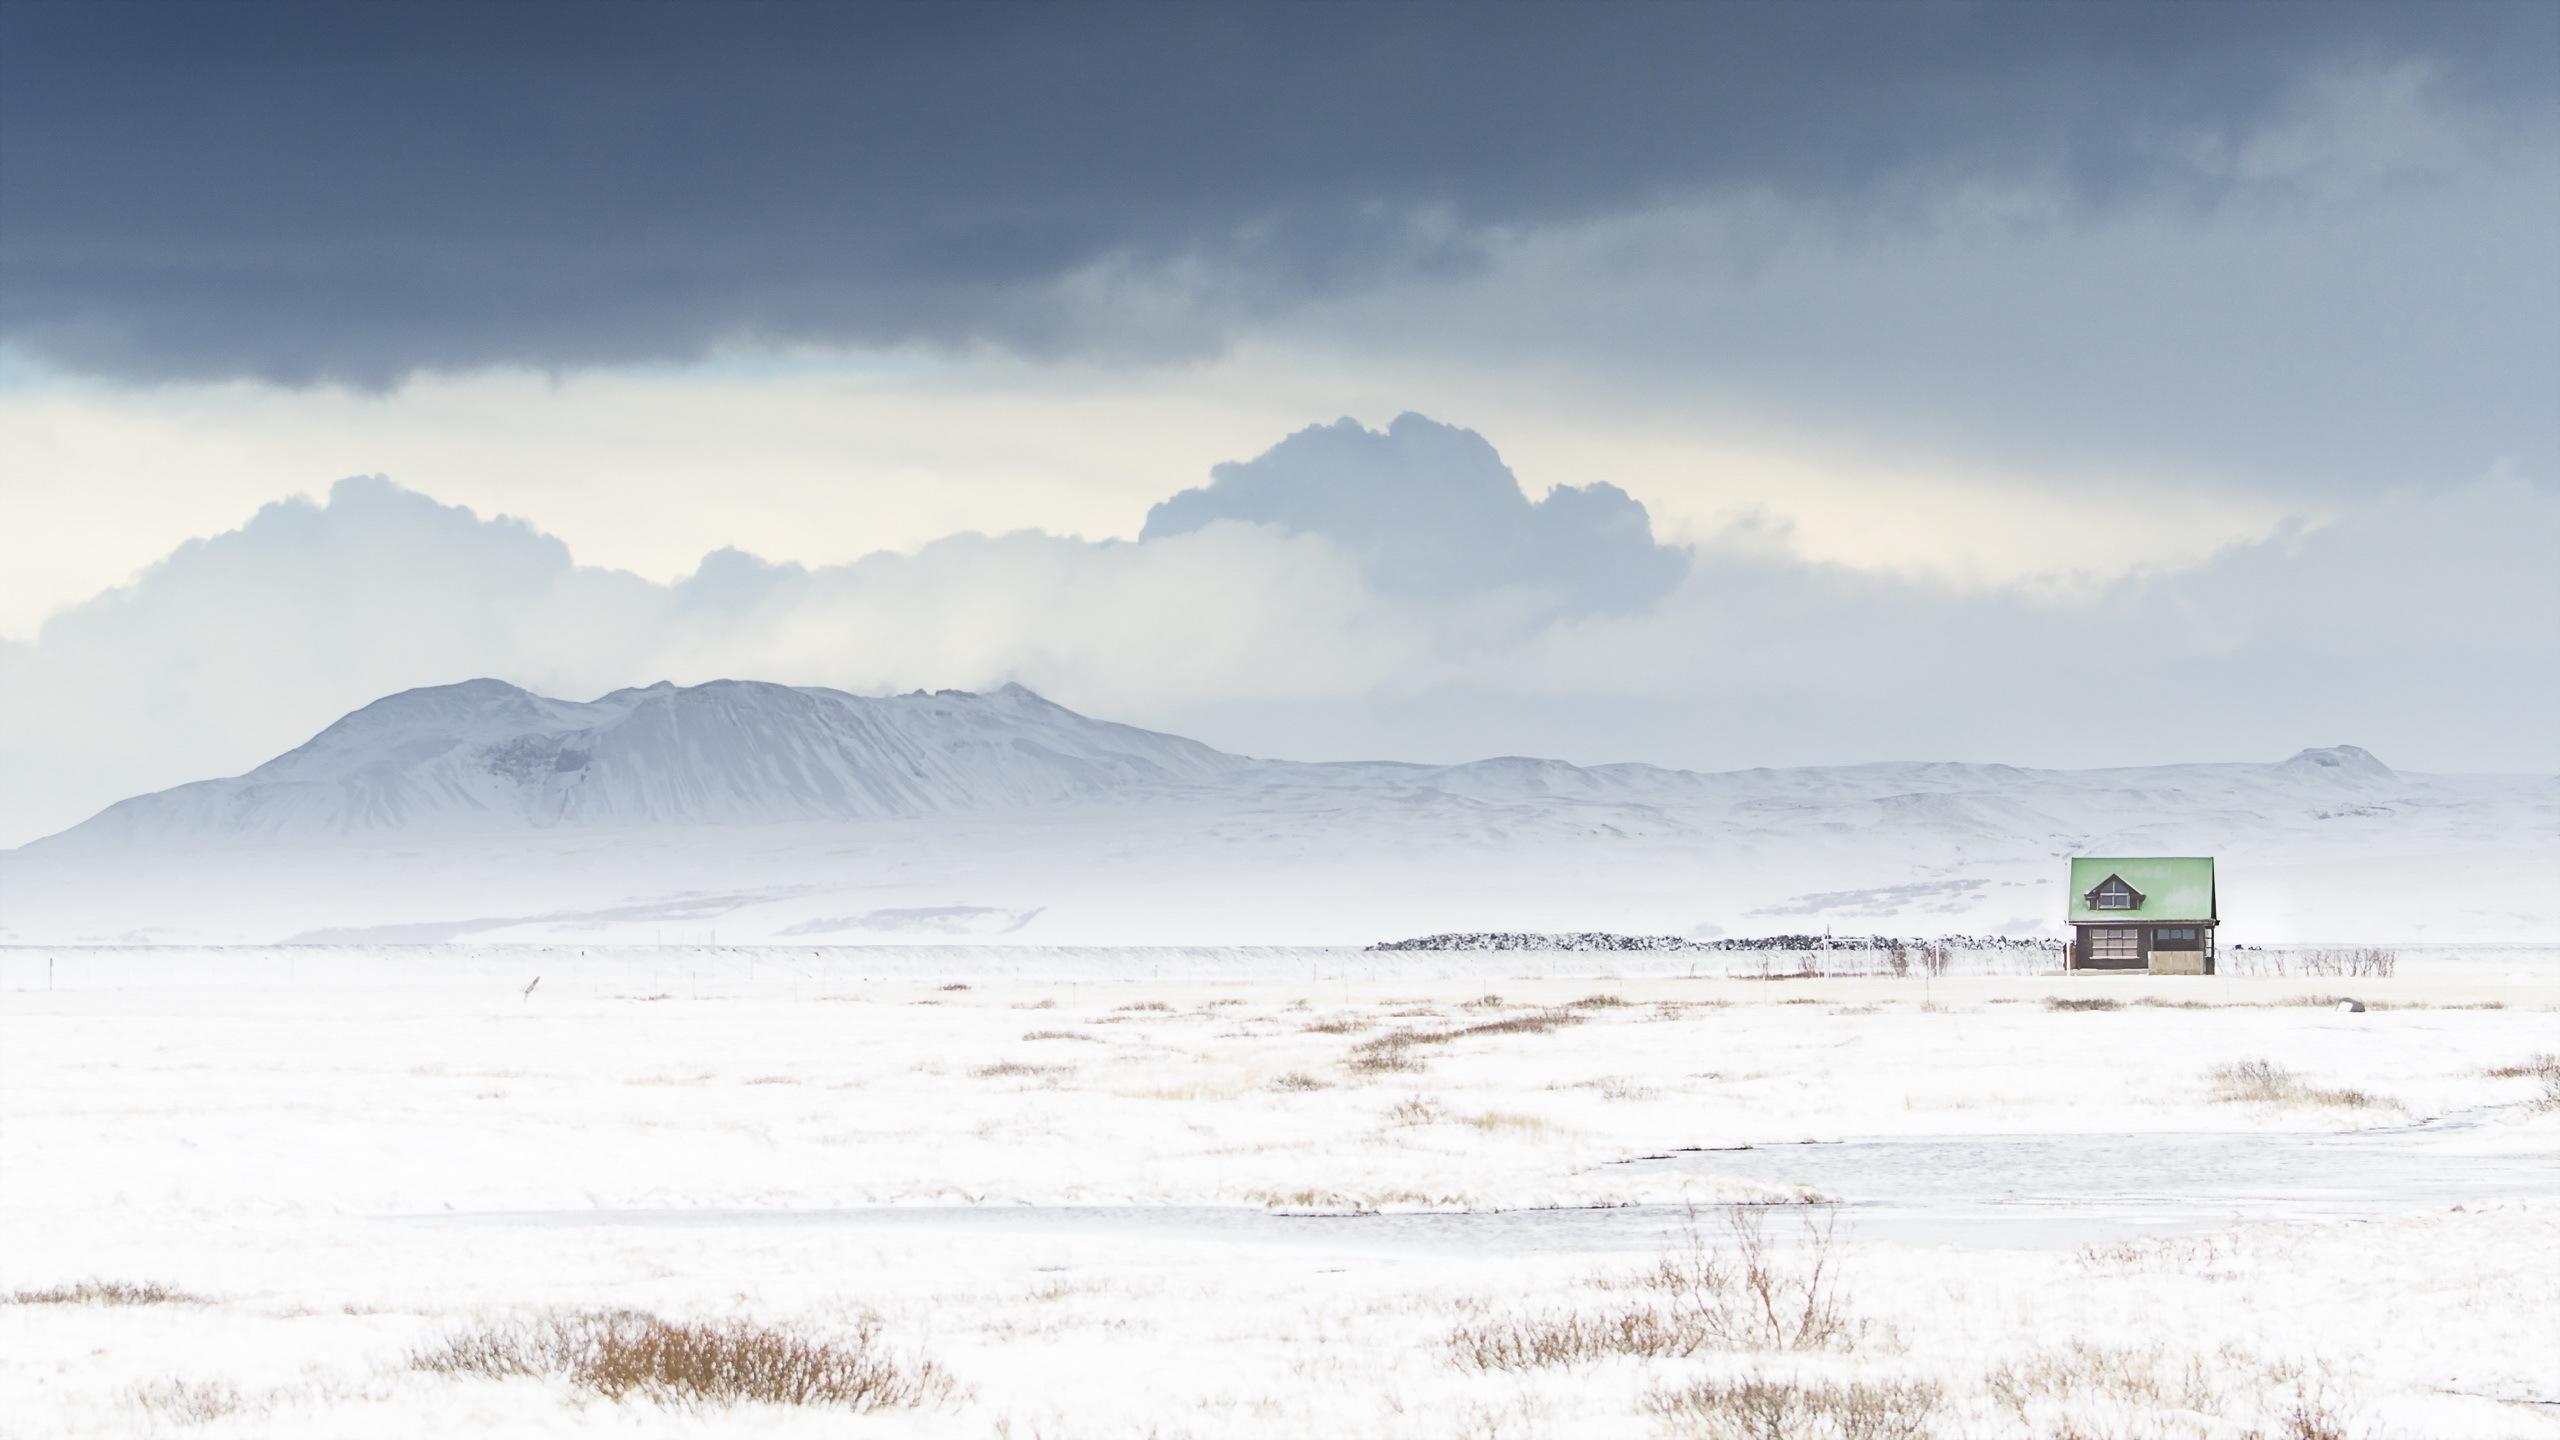 White Iceland / 2560 x 1440 / Landscape / Photography | MIRIADNA.COM